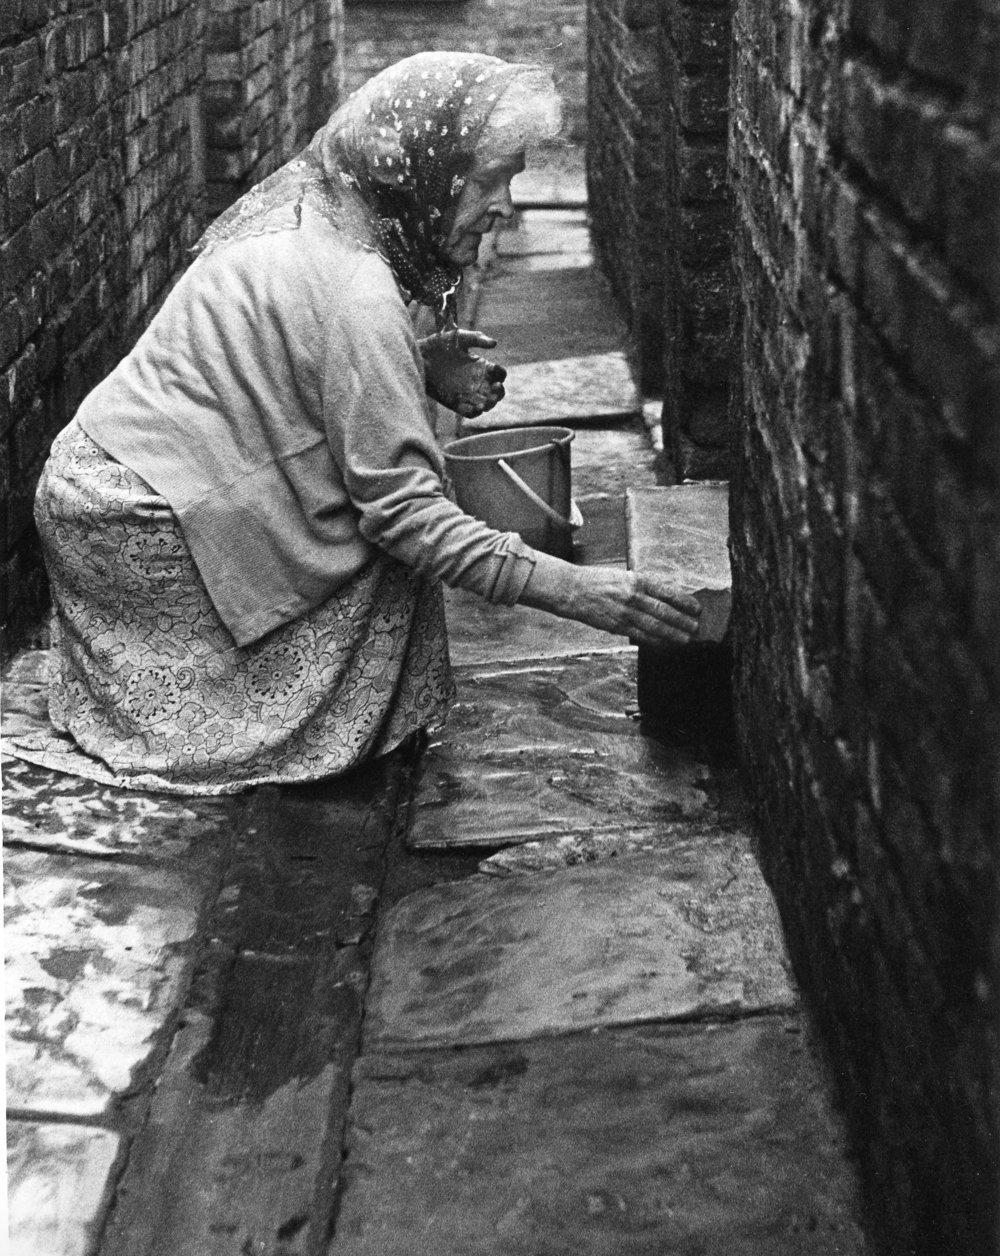 Woman Stoning Step, Salford, 16-71-2 (1962).jpg